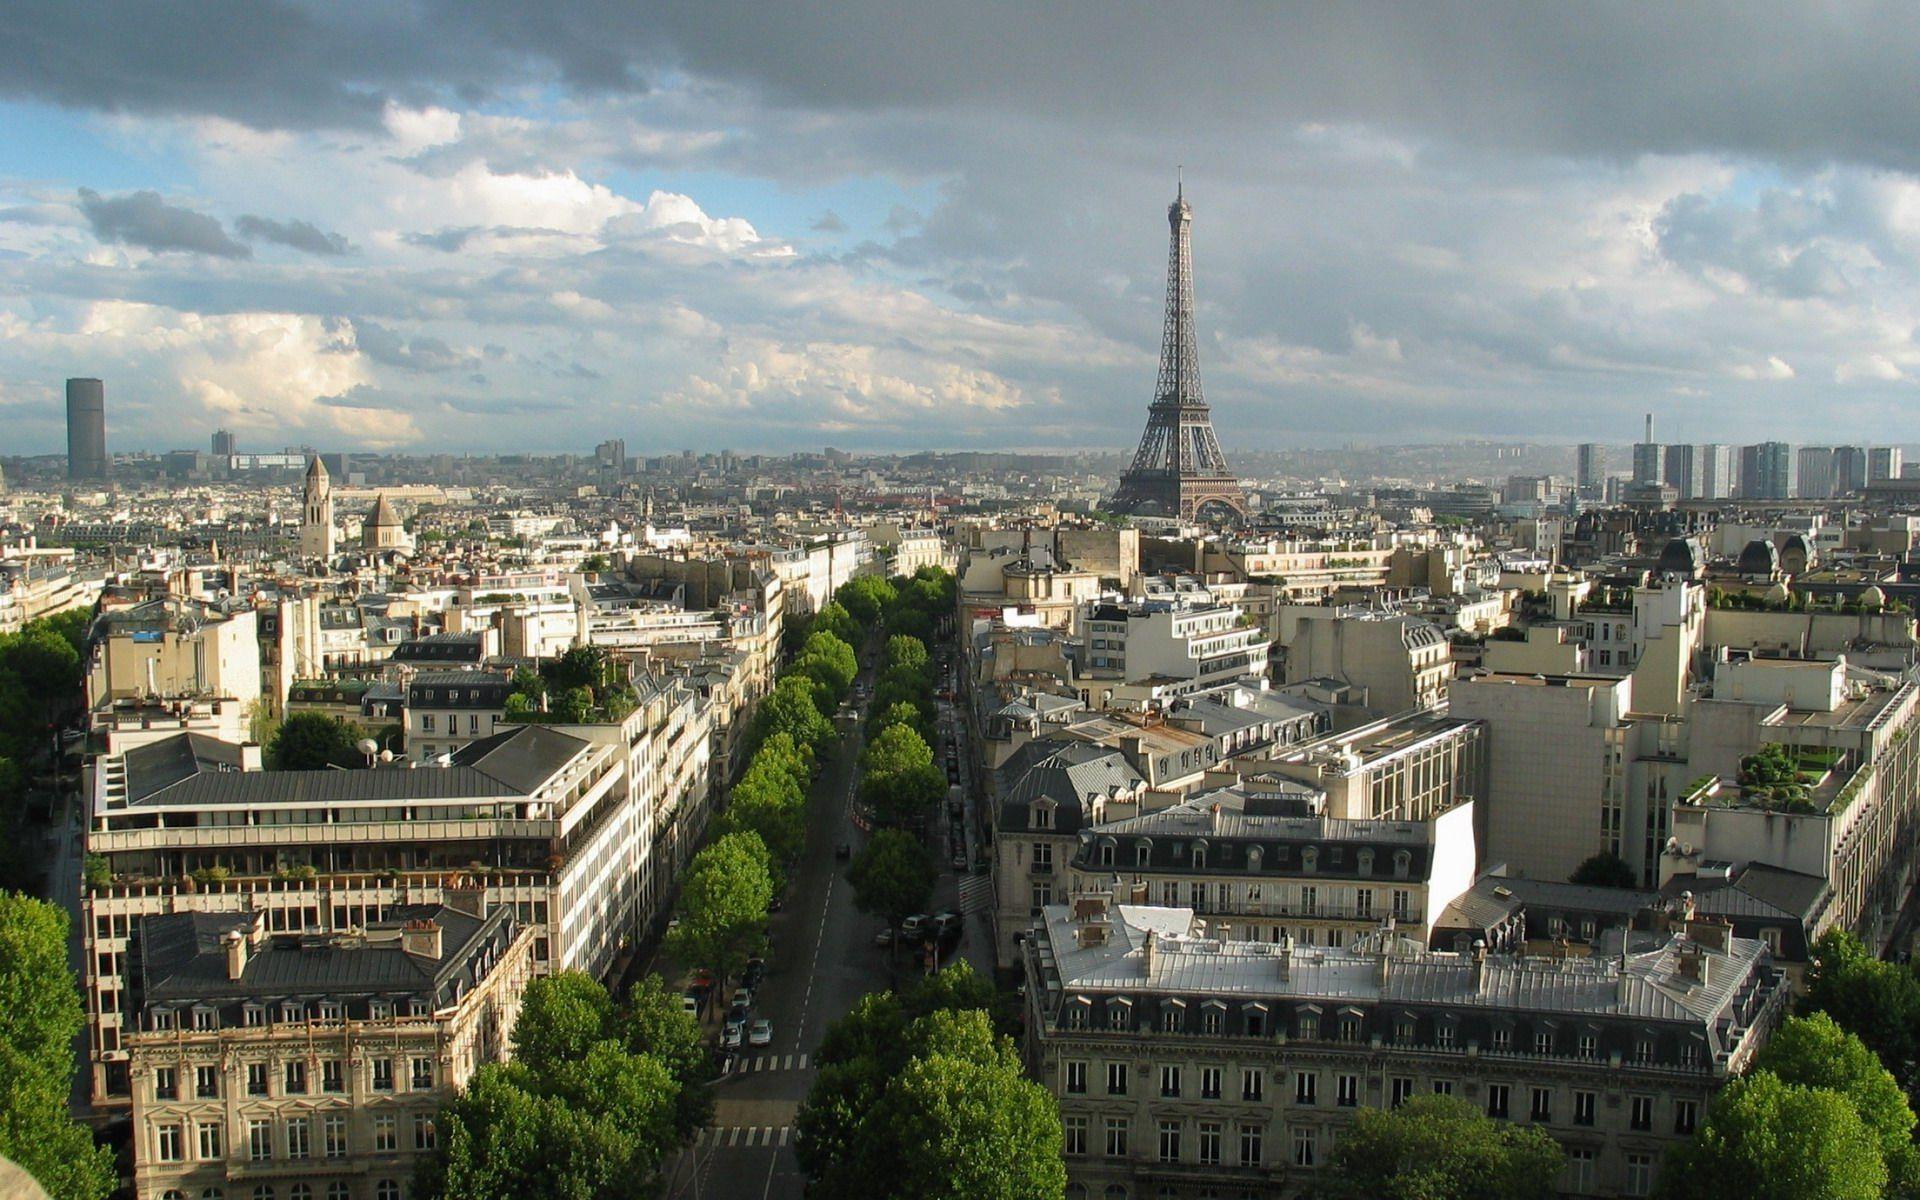 Pin by Will McQueen on Tour Eiffel / Eiffel Tower | Pinterest ...